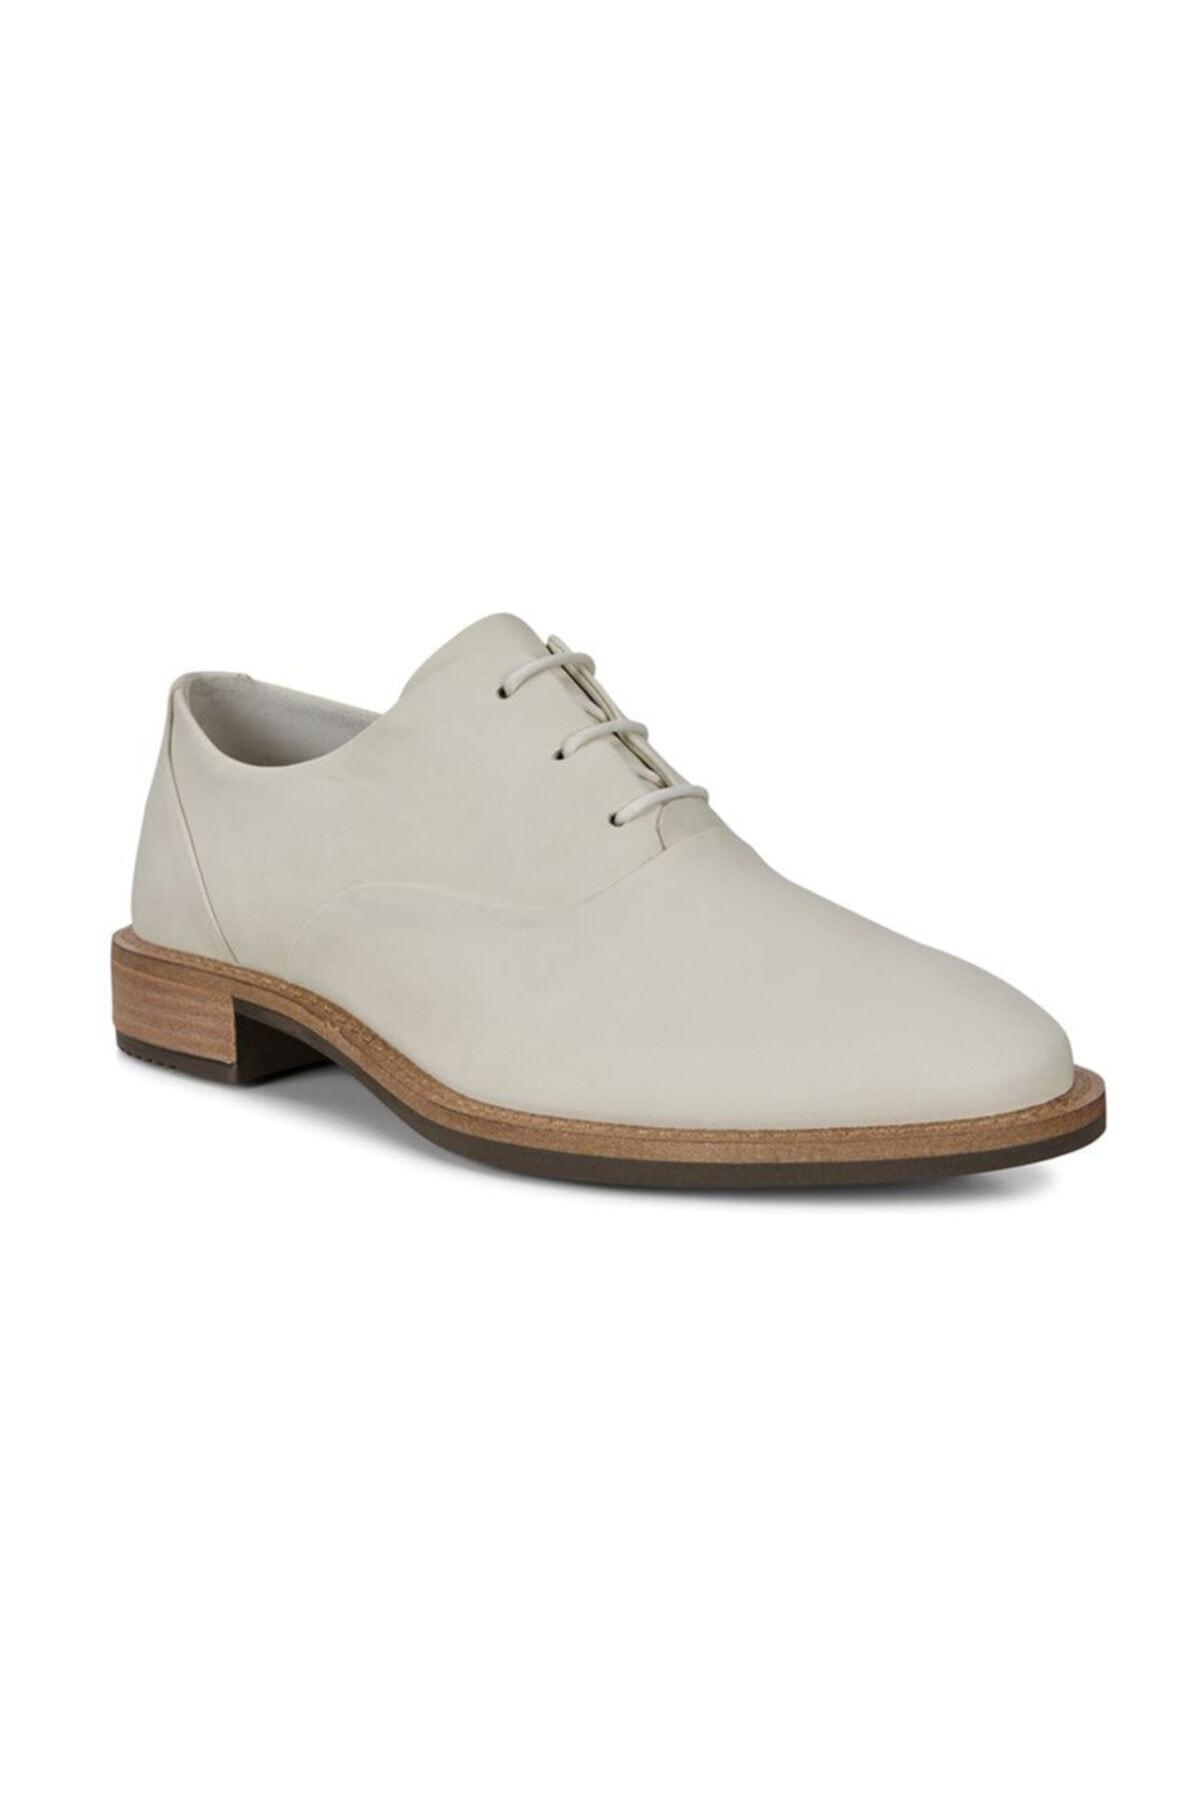 Ecco Kadın Beyaz Sneaker 26640301152 Sartorelle 25 Tailored Shadow White